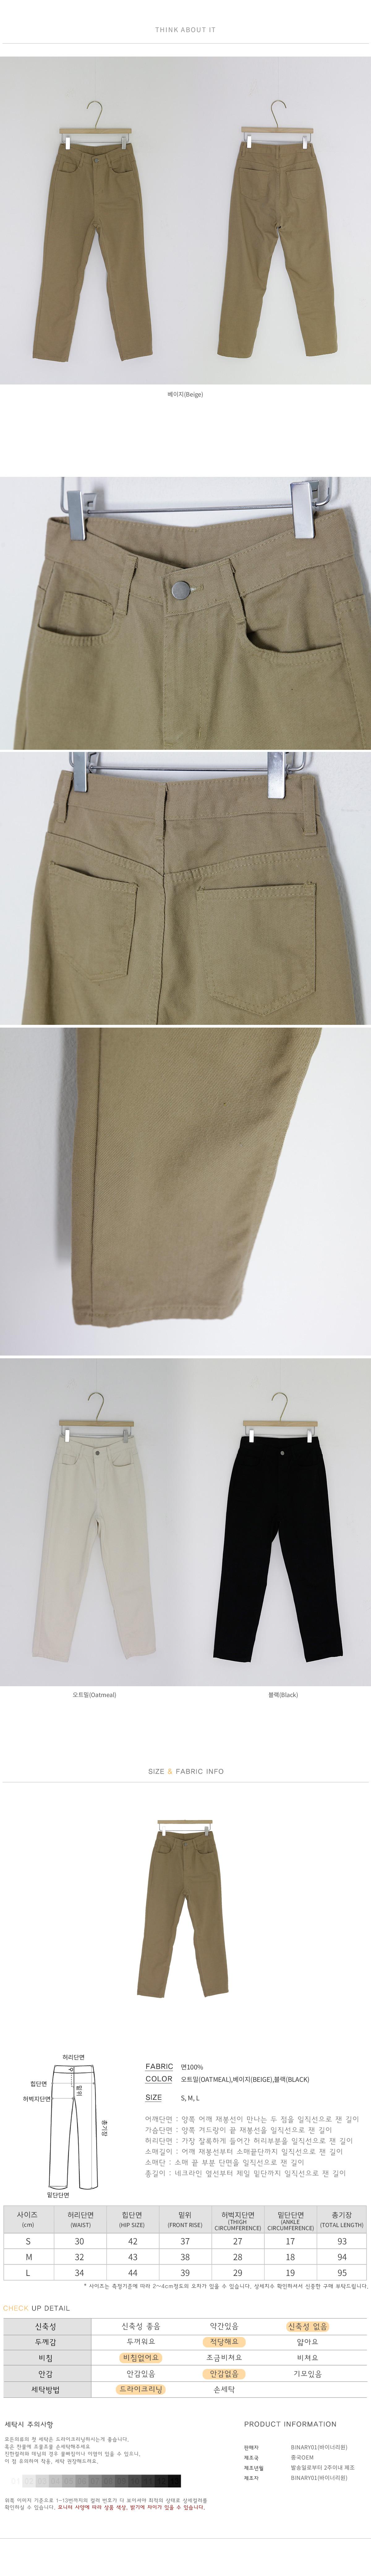 Inclu Cotton Pants